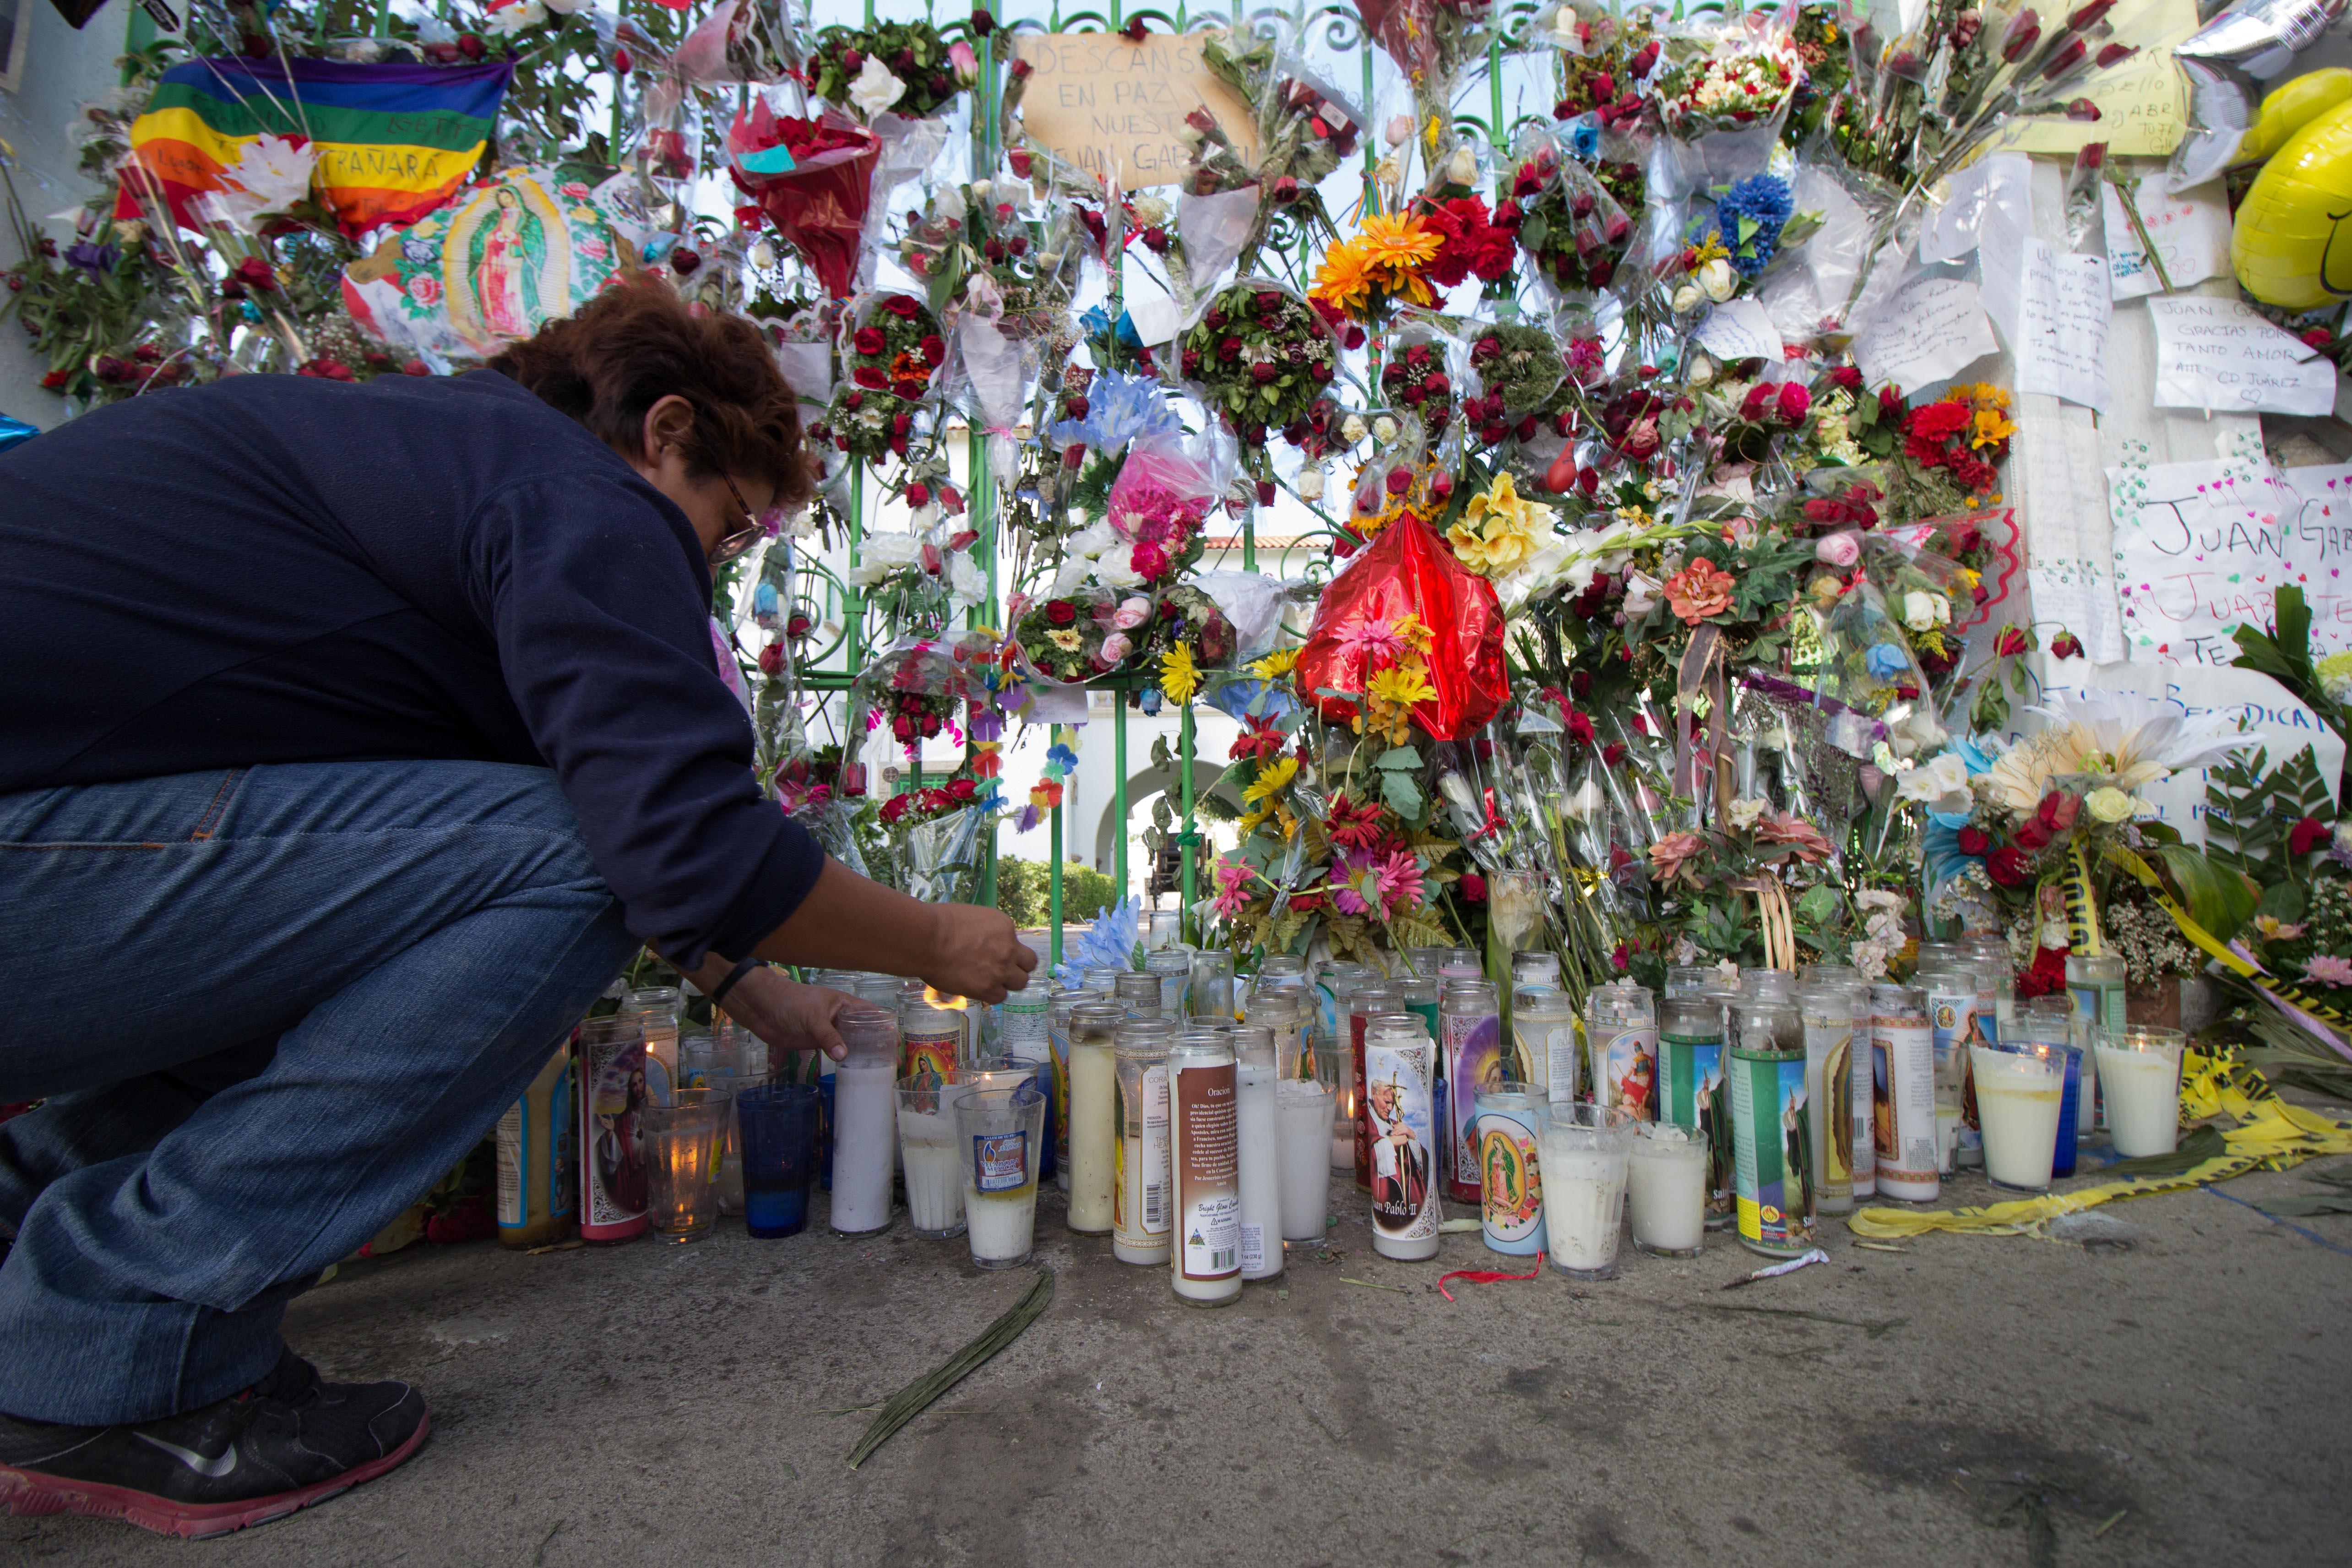 PHOTOS: Thousands of Fans Pay Tribute to Juan Gabriel in His Hometown of Ciudad Juárez